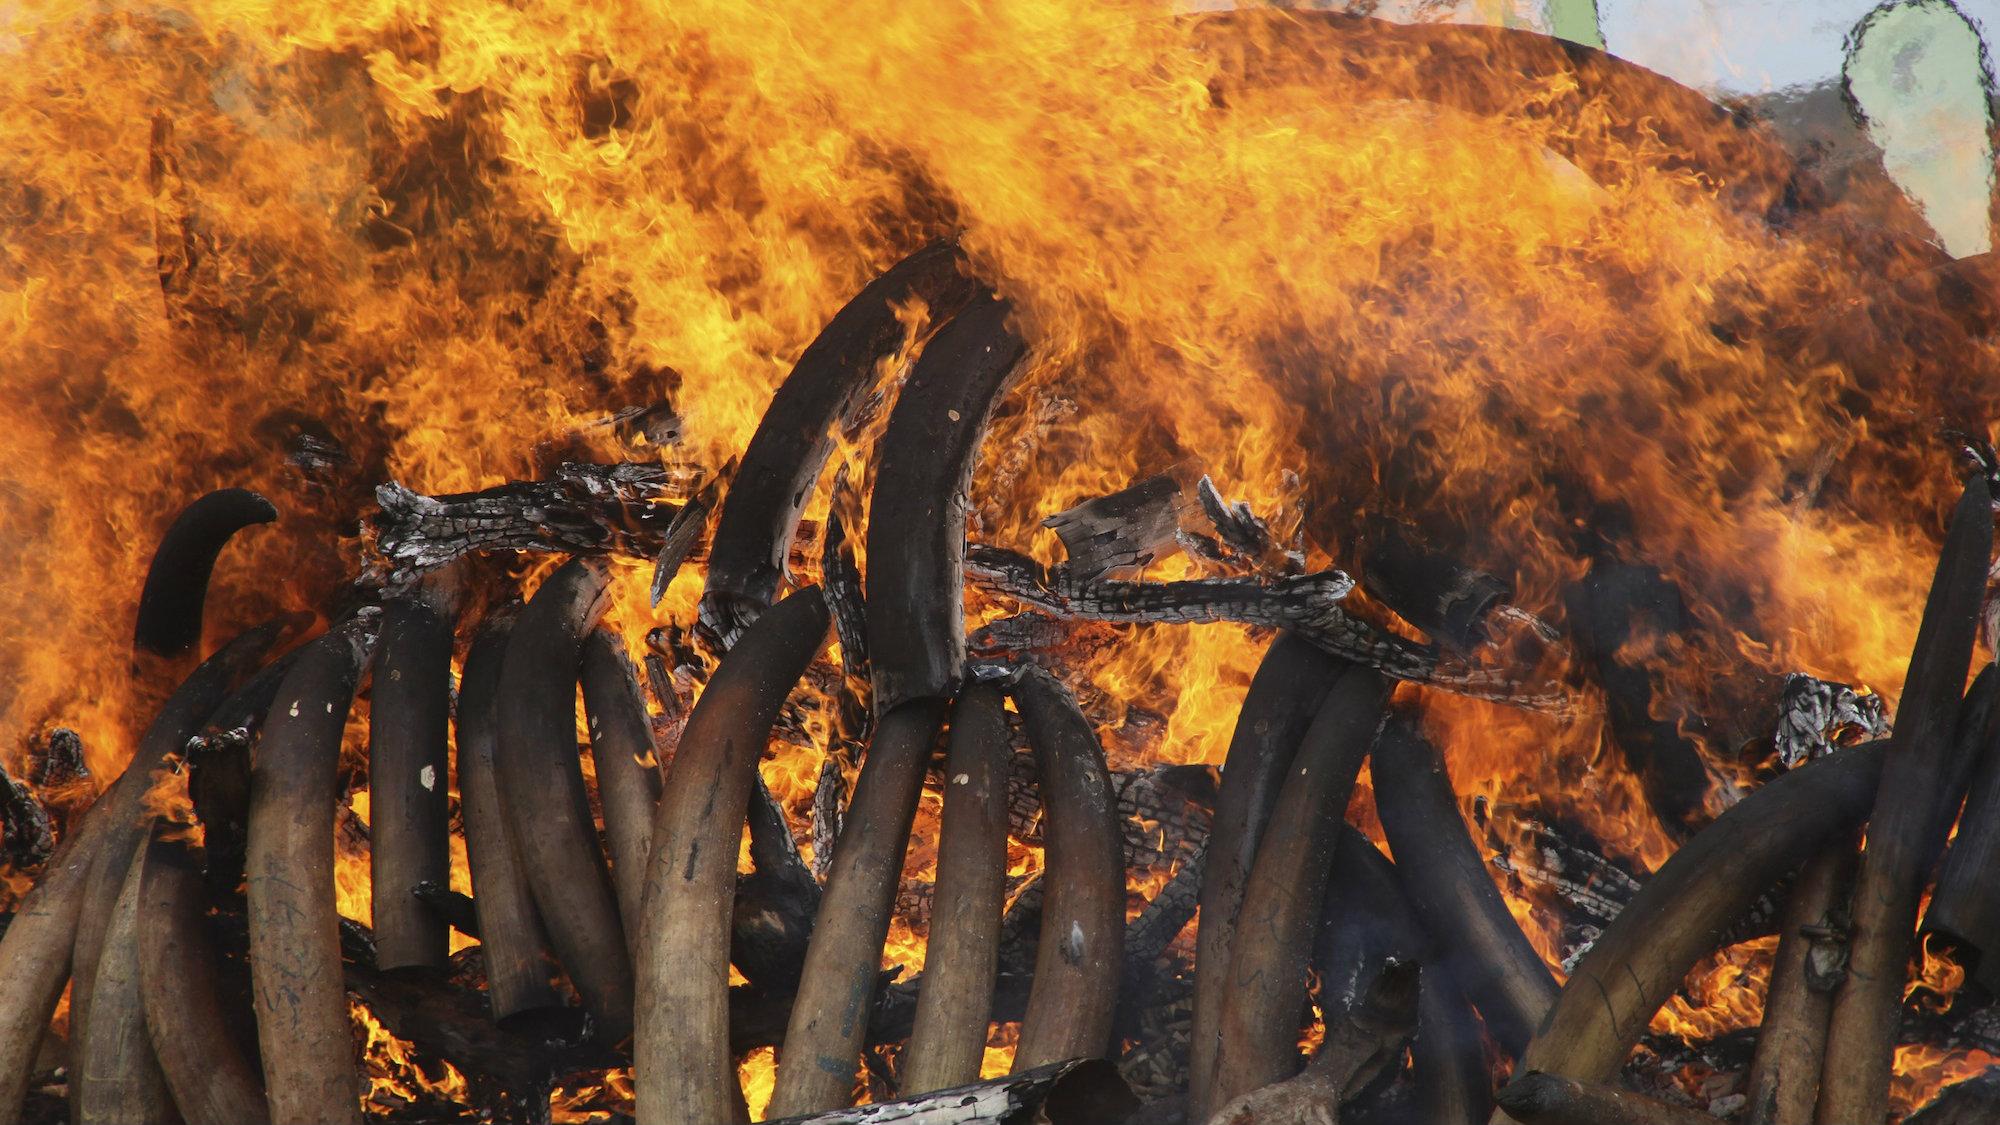 An ivory burning in Kenya in 2011.